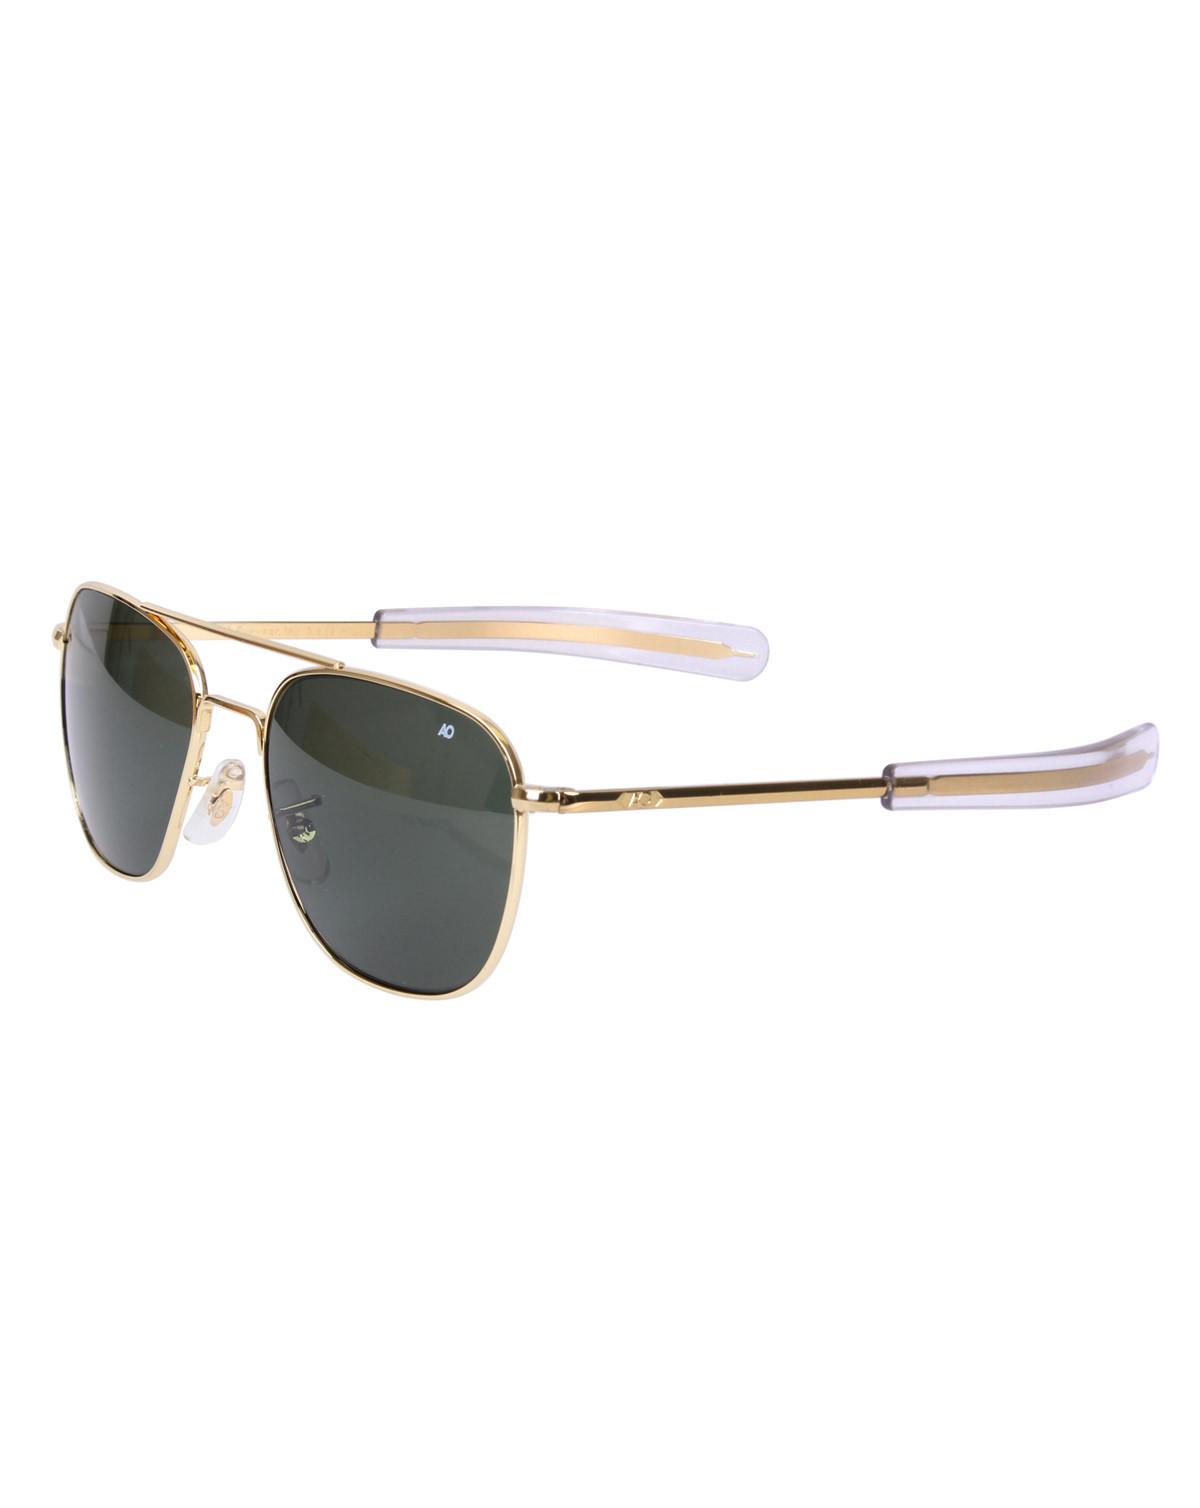 Rothco Pilots Solglasögon American Optical Original (Gold w. Green Lens, 55)